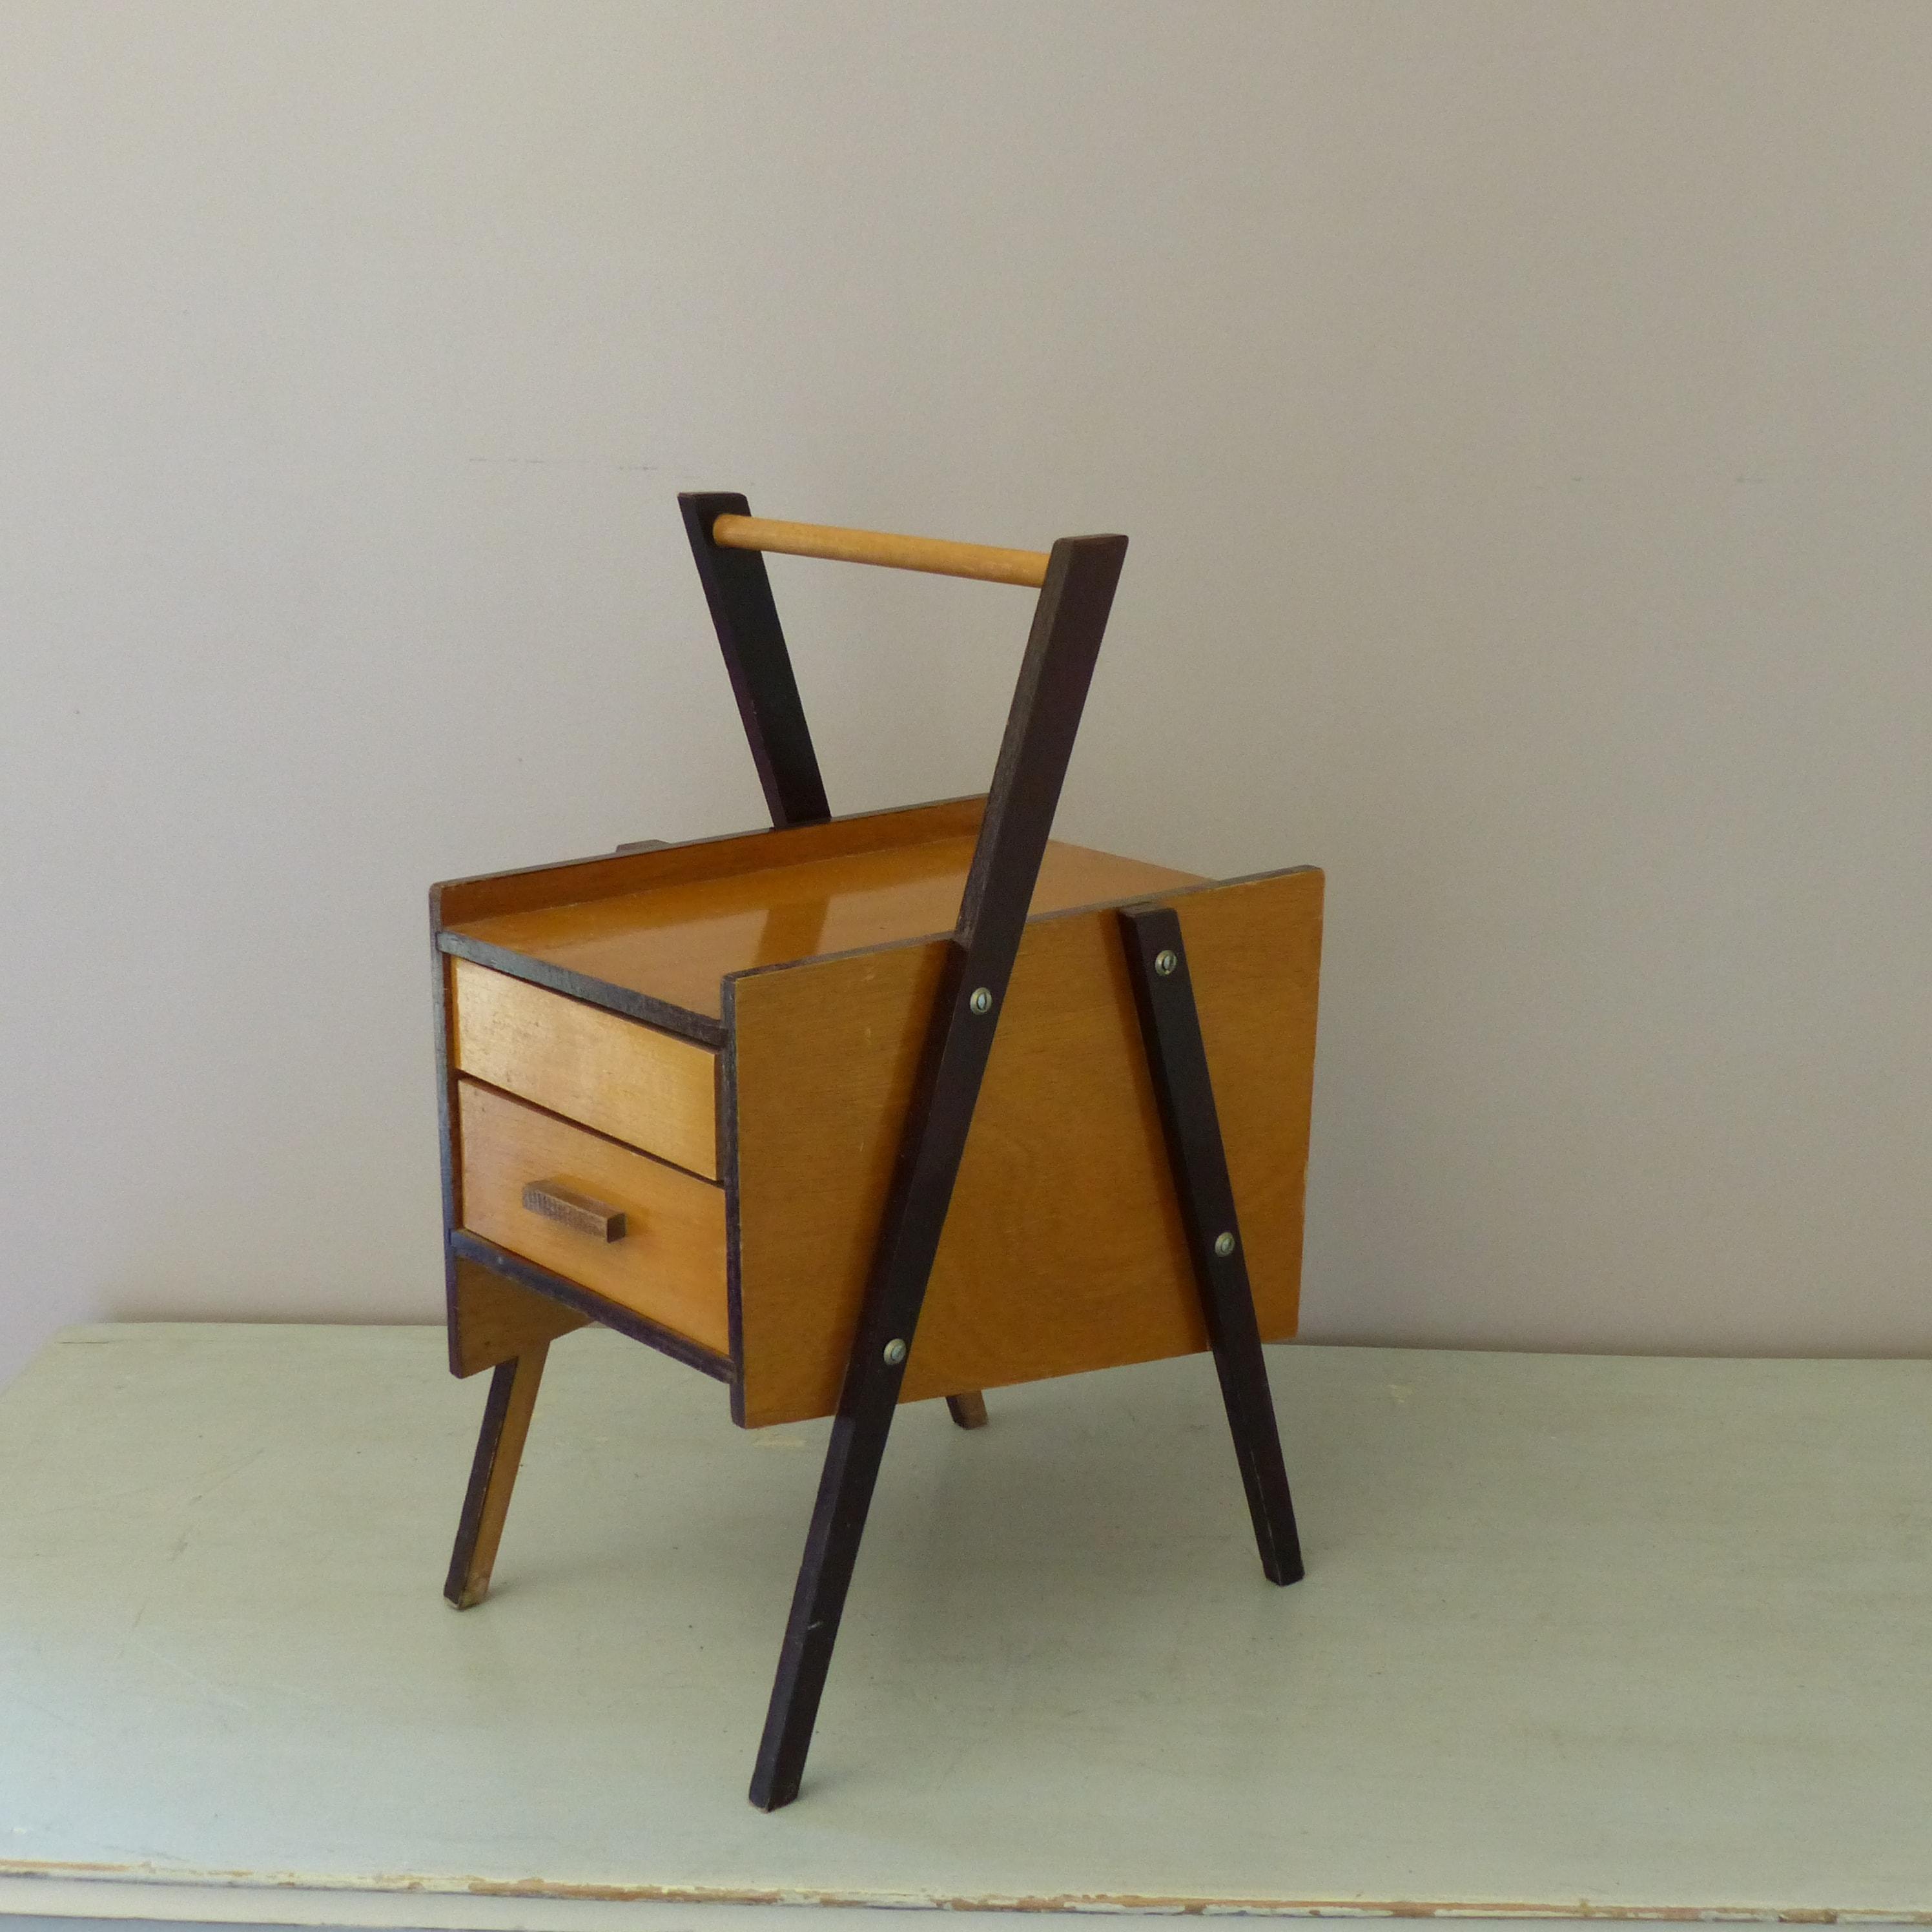 petite travailleuse vintage lignedebrocante brocante en ligne chine pour vous meubles. Black Bedroom Furniture Sets. Home Design Ideas